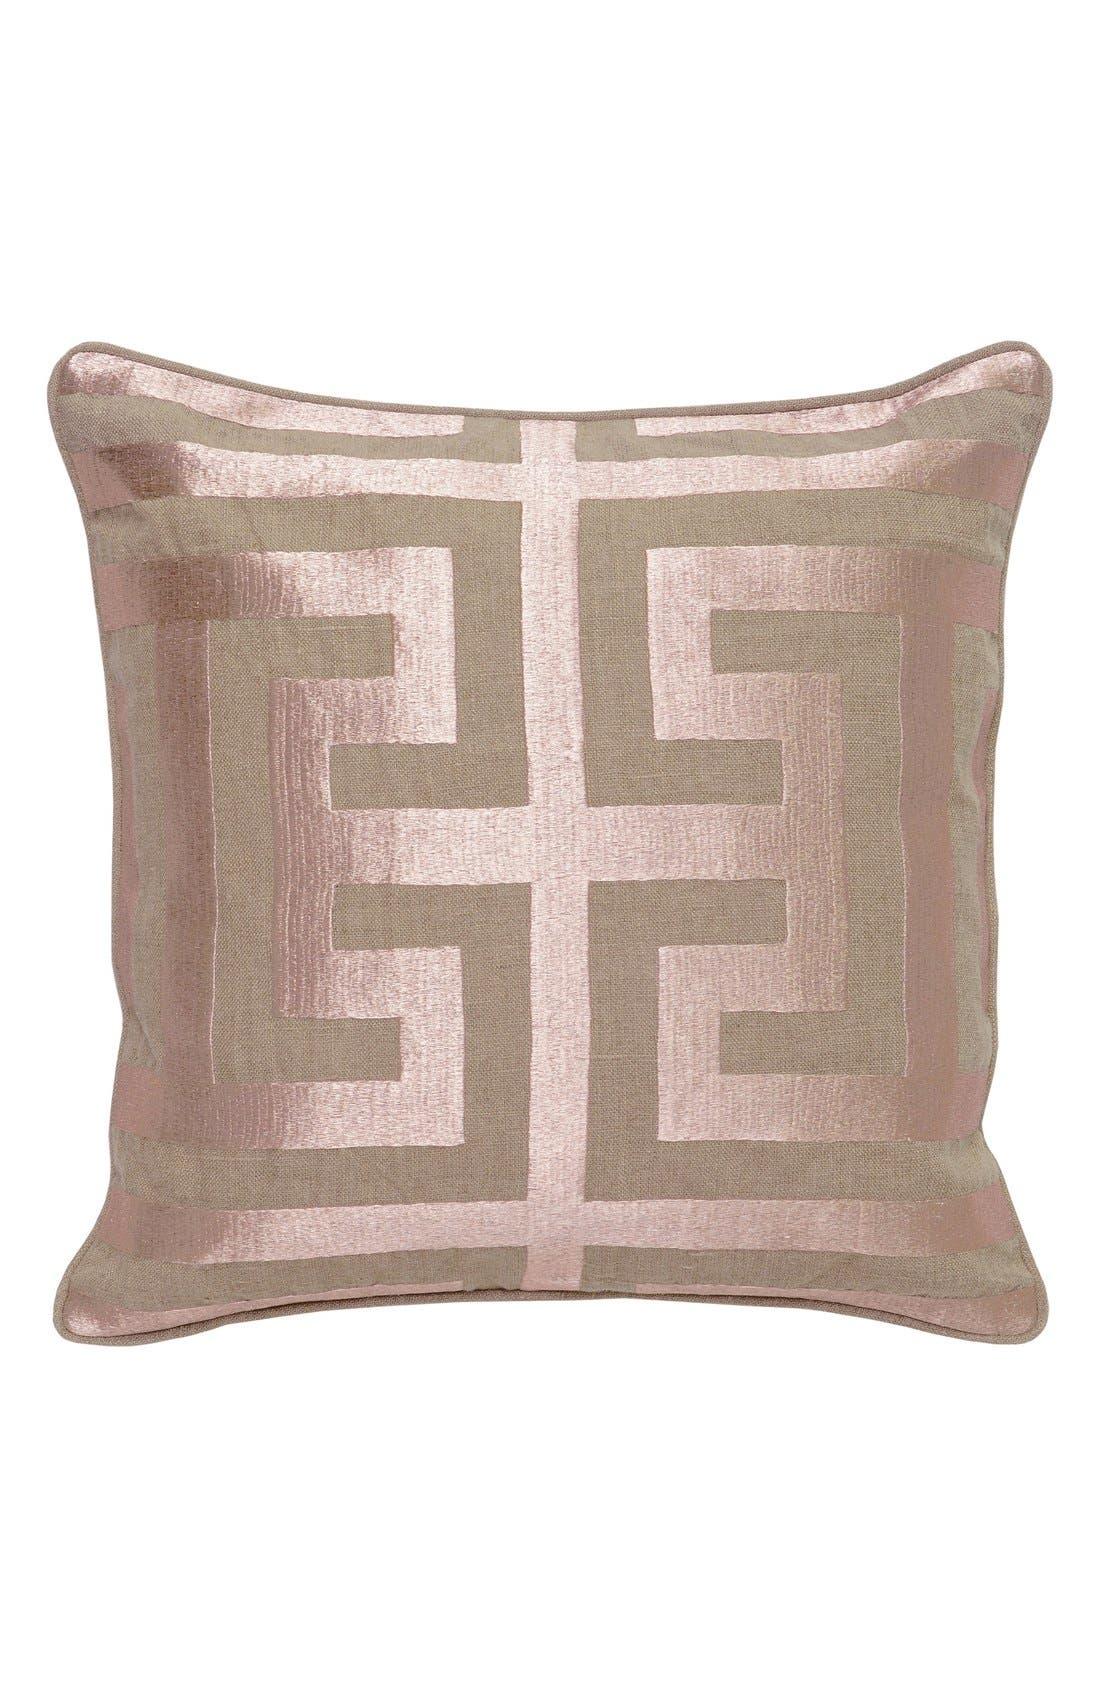 Villa Home Collection 'Capital' Decorative Pillow